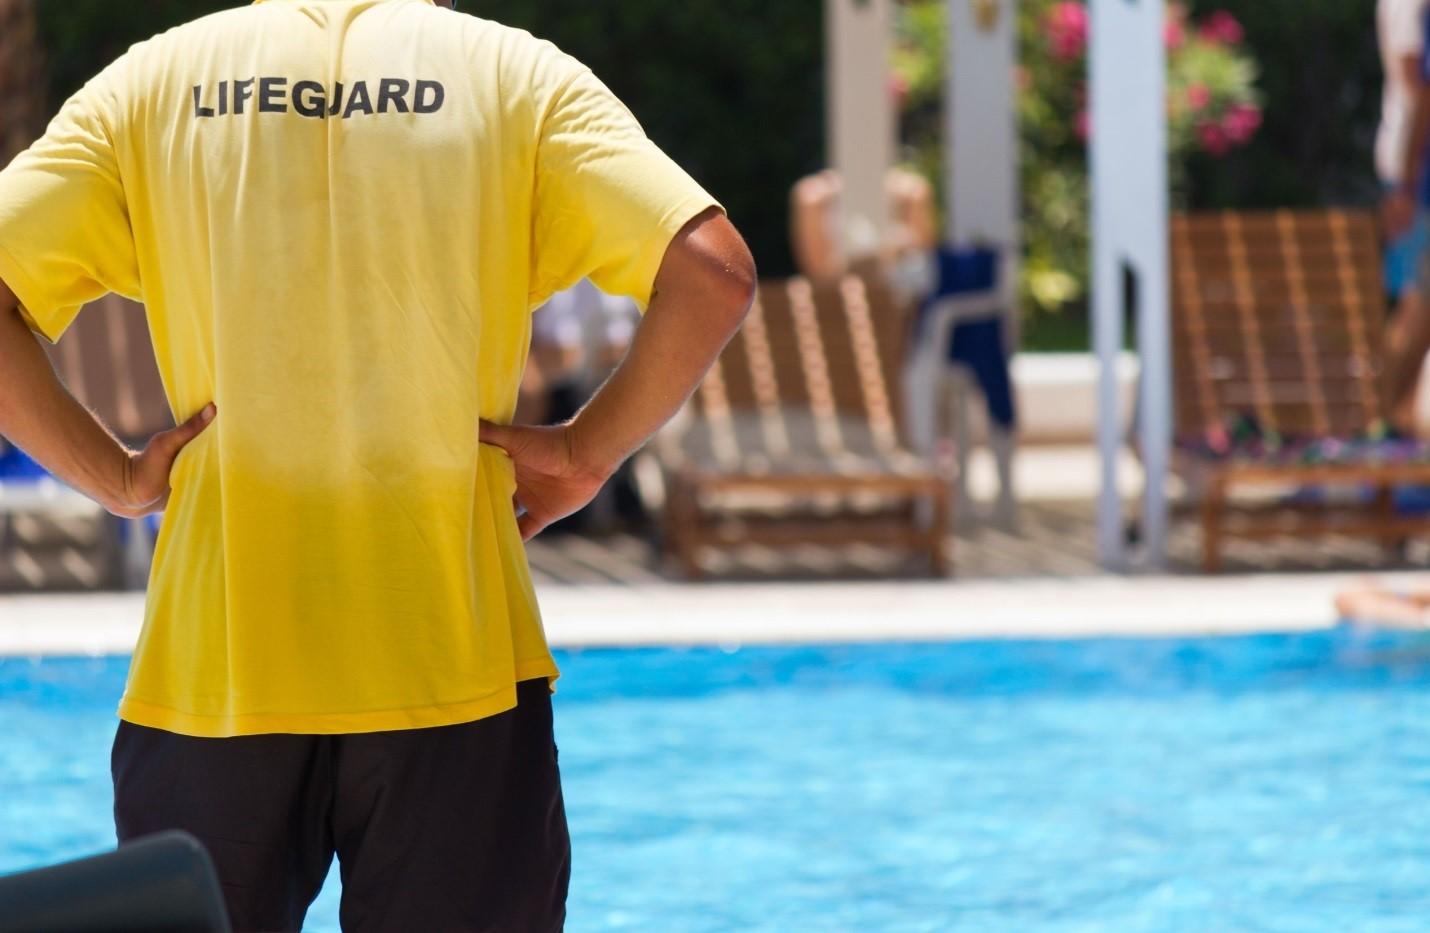 The 1.5 Million Kids on Cruises Each Year Need Lifeguards - Cruse Injury Lawyer